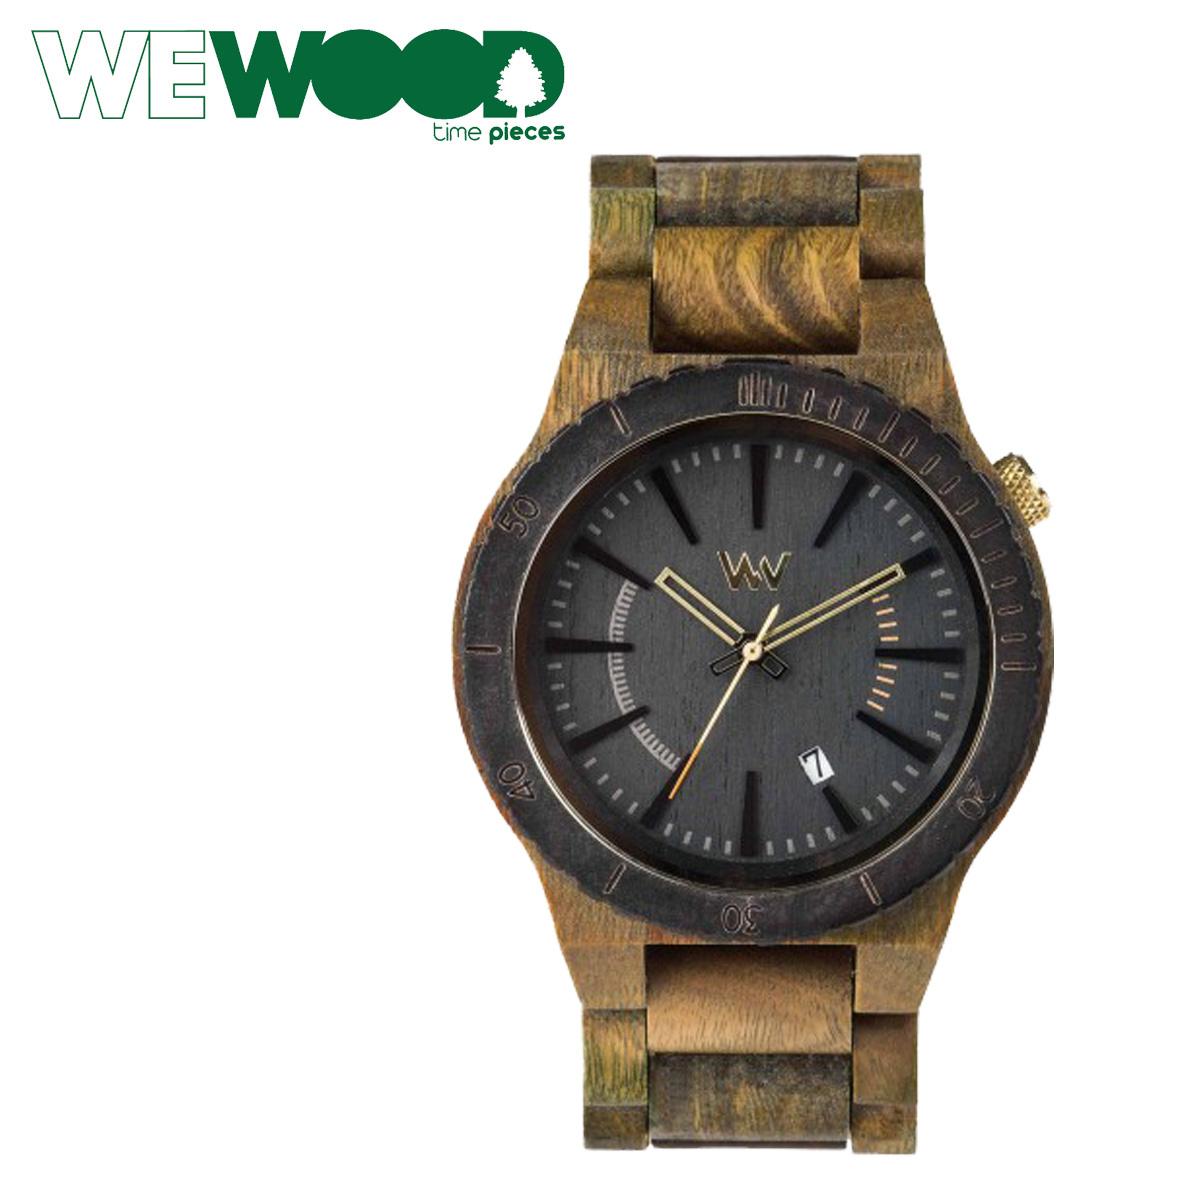 WEWOOD 腕時計 ウィーウッド メンズ レディース ASSUNT ARMY WASNAR グリーン